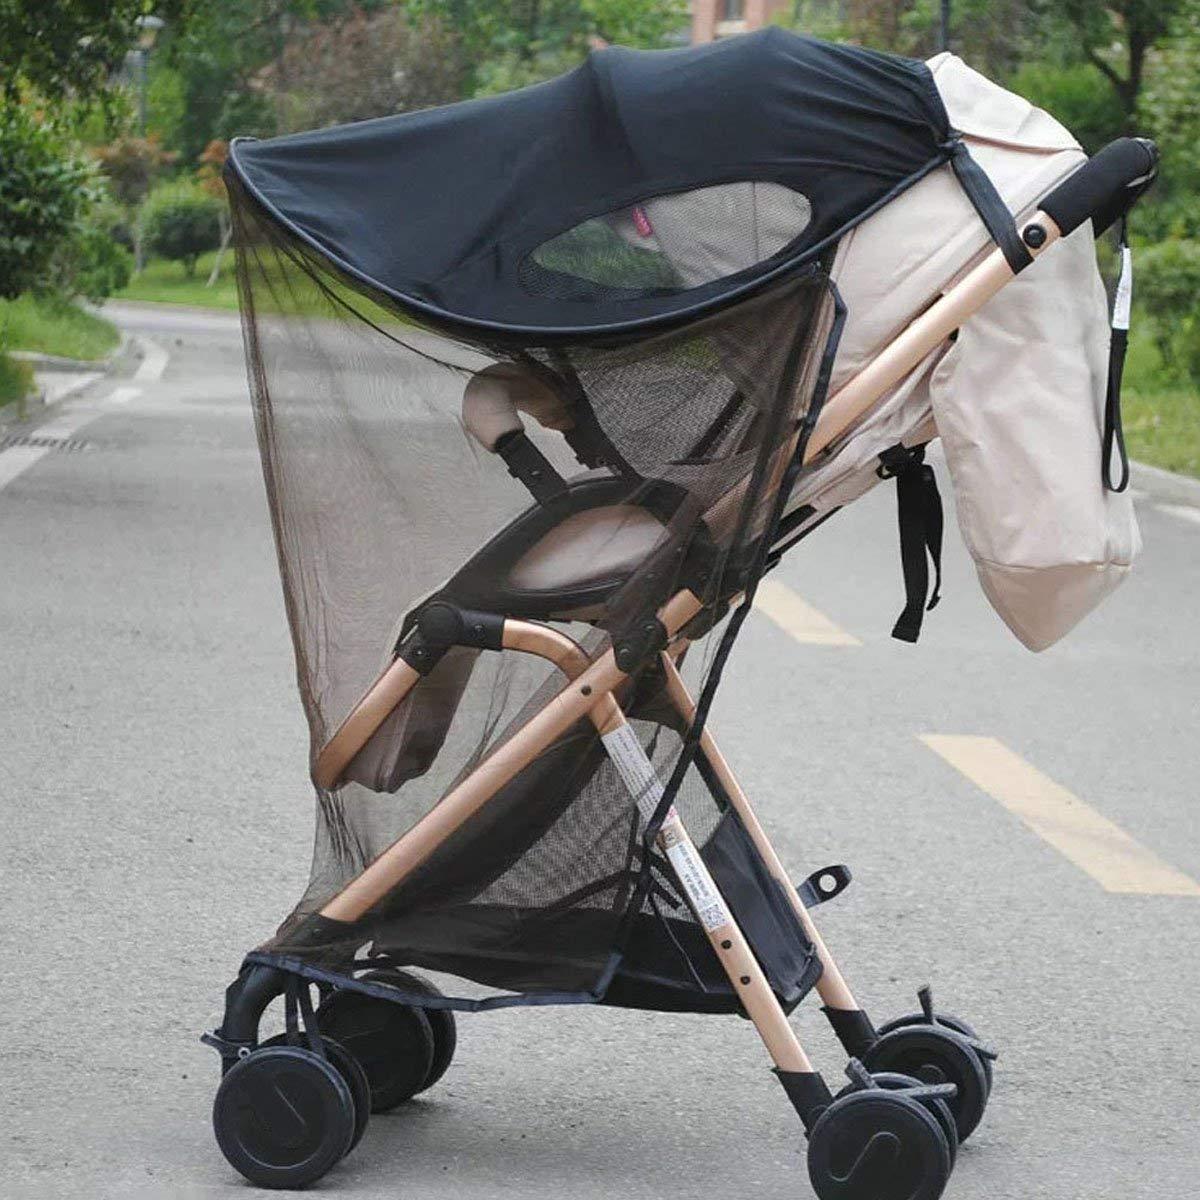 MHOYI Universal Buggy Sun Shade Pram Baby Sun Sail for Strollers Pushchairs Black 2